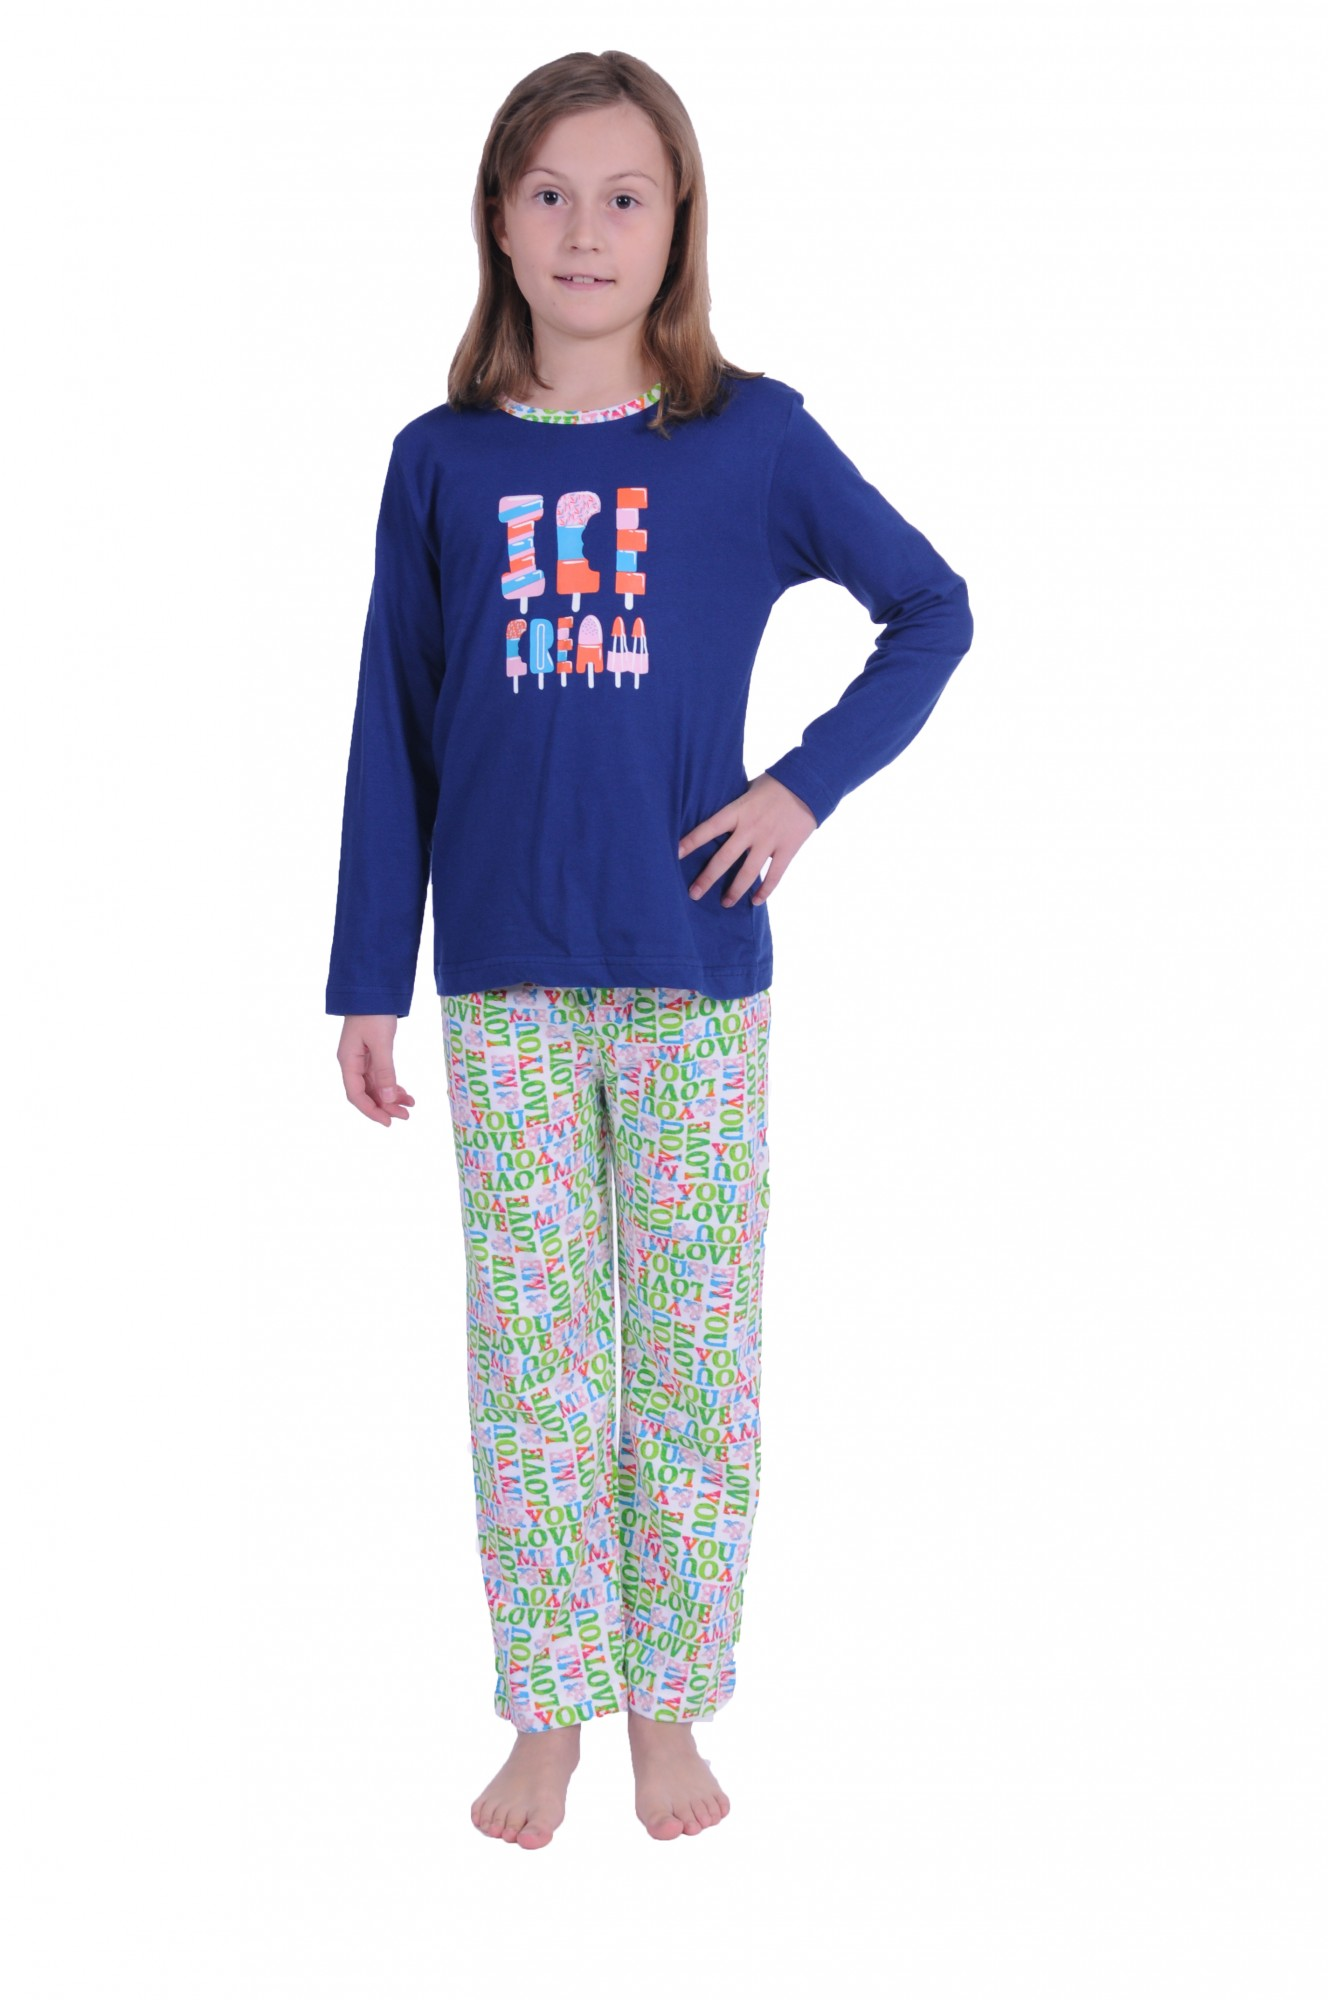 feeeeb5ff4 Cooler Mädchen Kinder Pyjama langarm in tollen Farben 171 401 90 842 ...